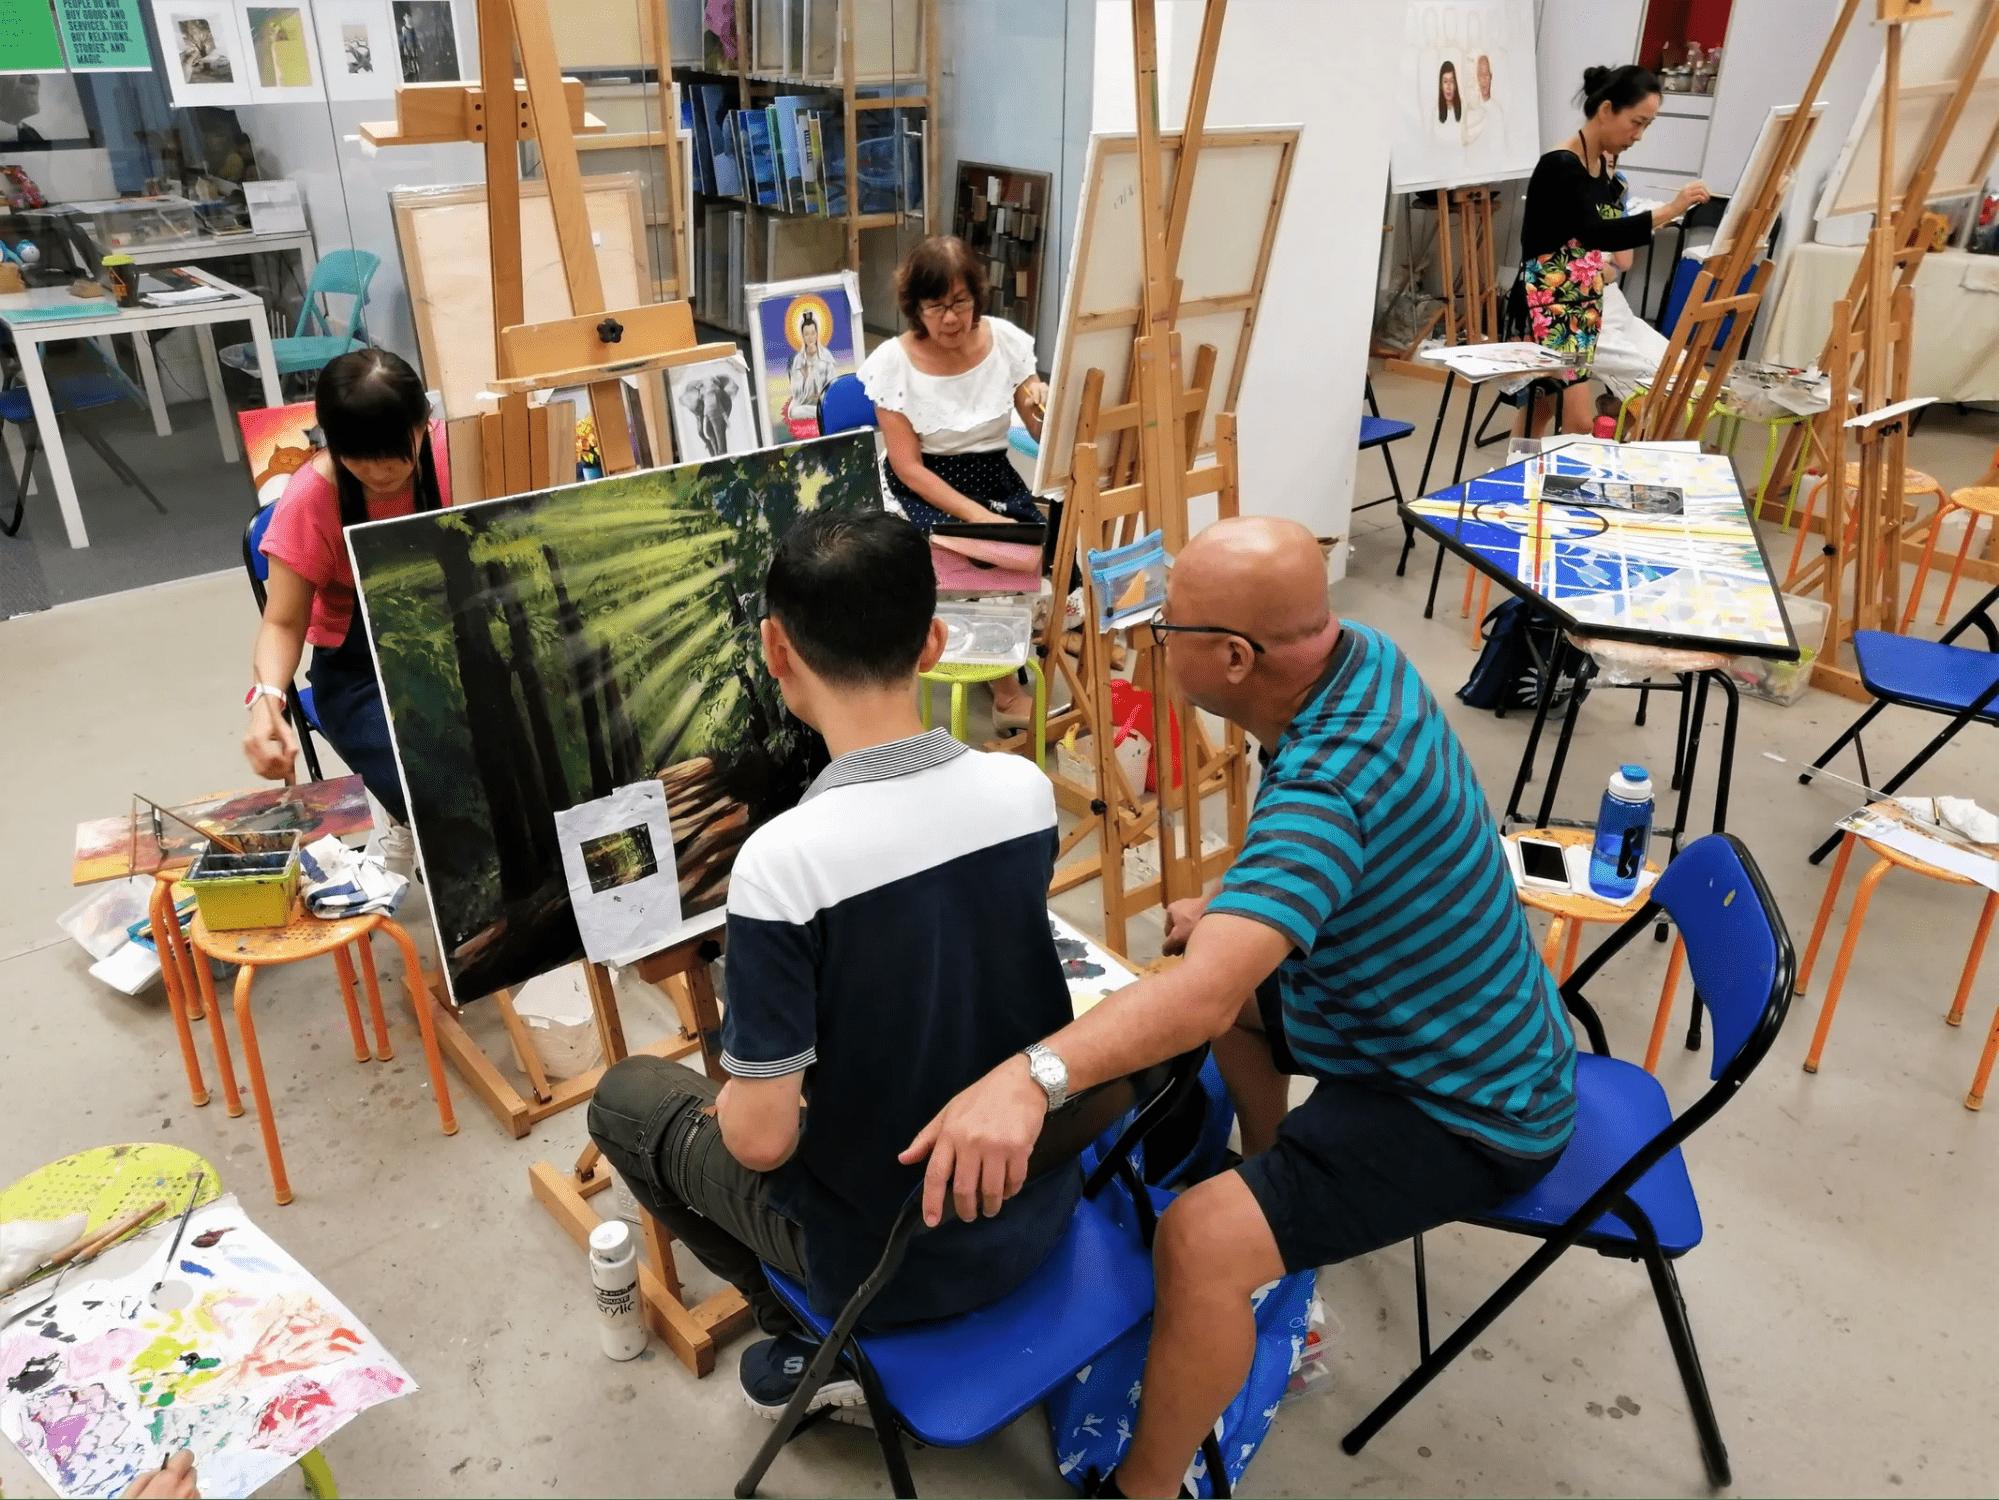 art dimension studio, assisi fun day 2020